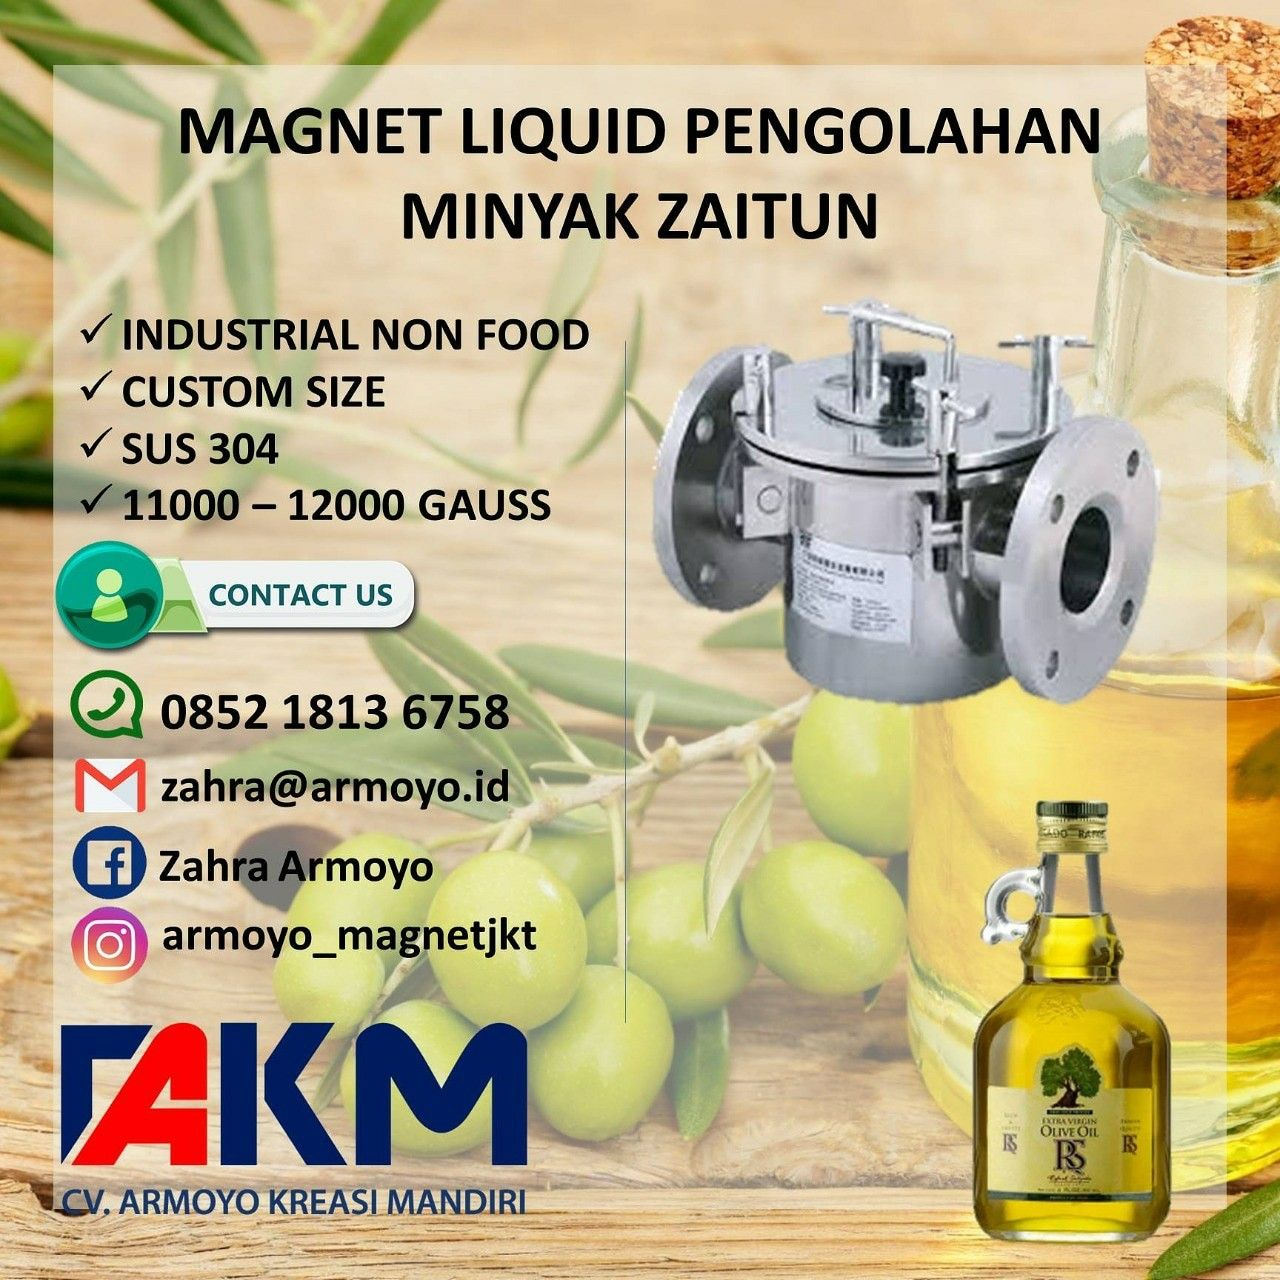 Magnet Liquid Pengolahan Minyak Zaitun Di 2020 Minyak Zaitun Zaitun Magnet